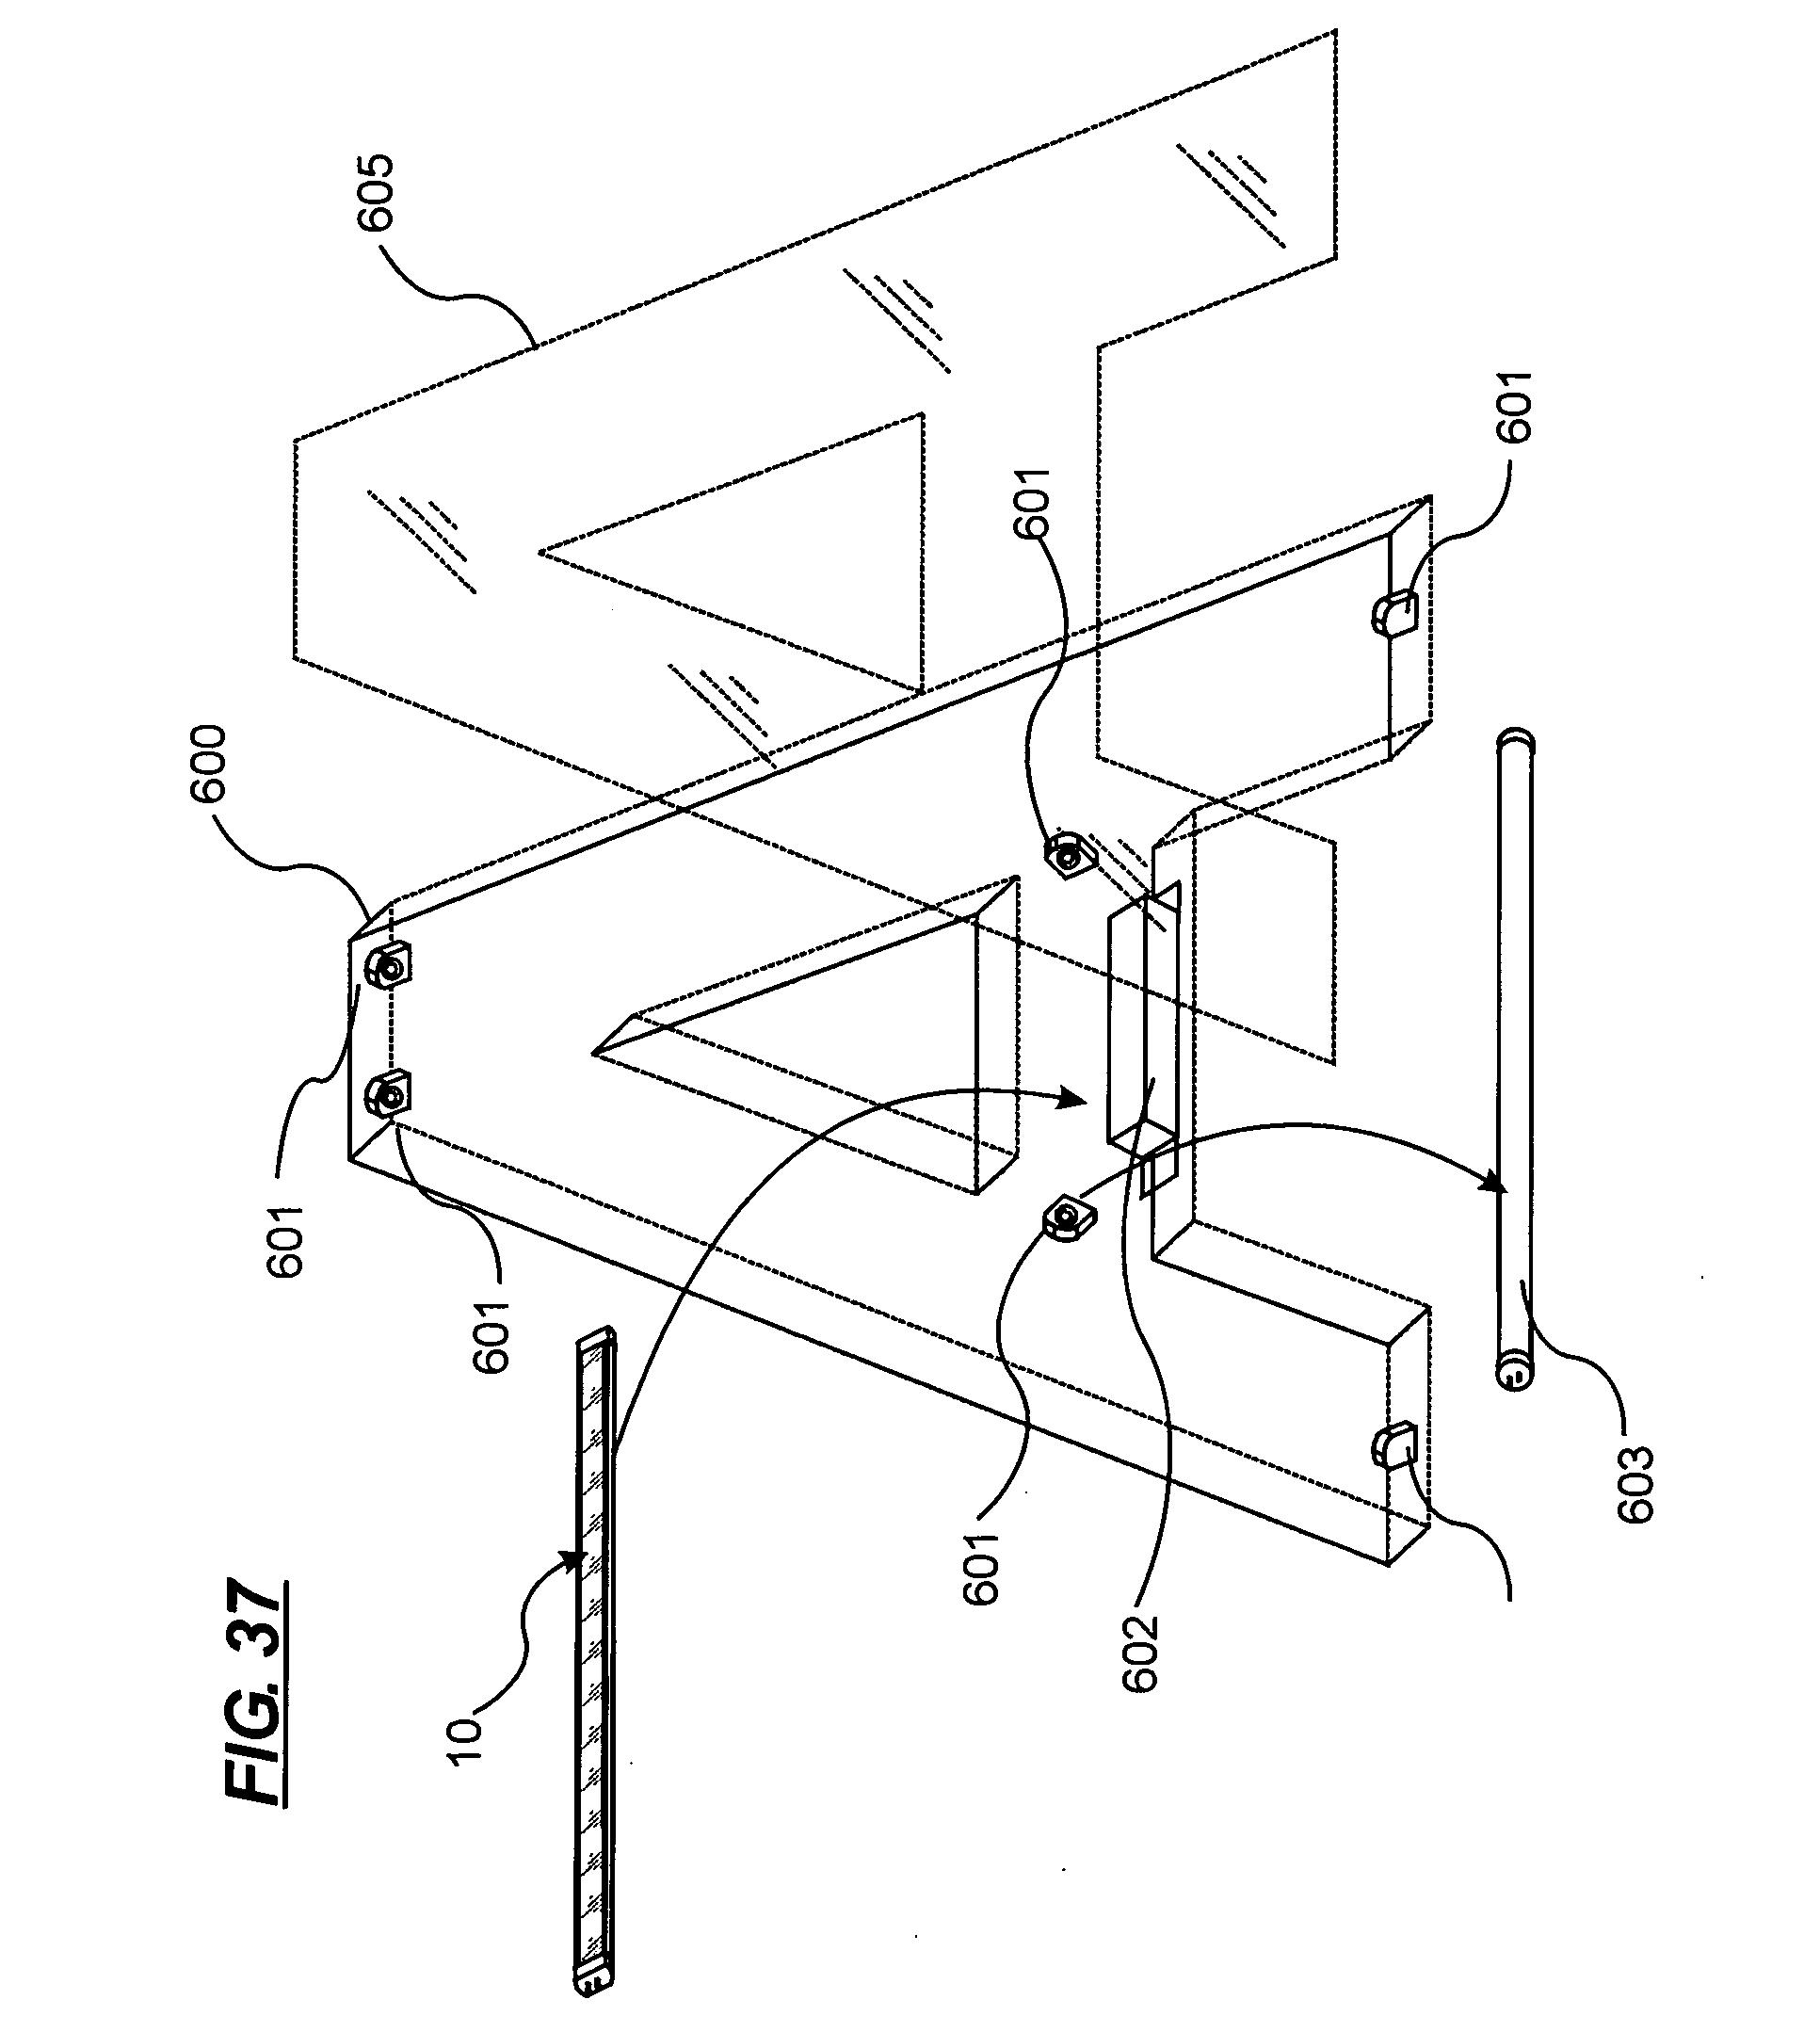 patent us20070183156 - led lighting system